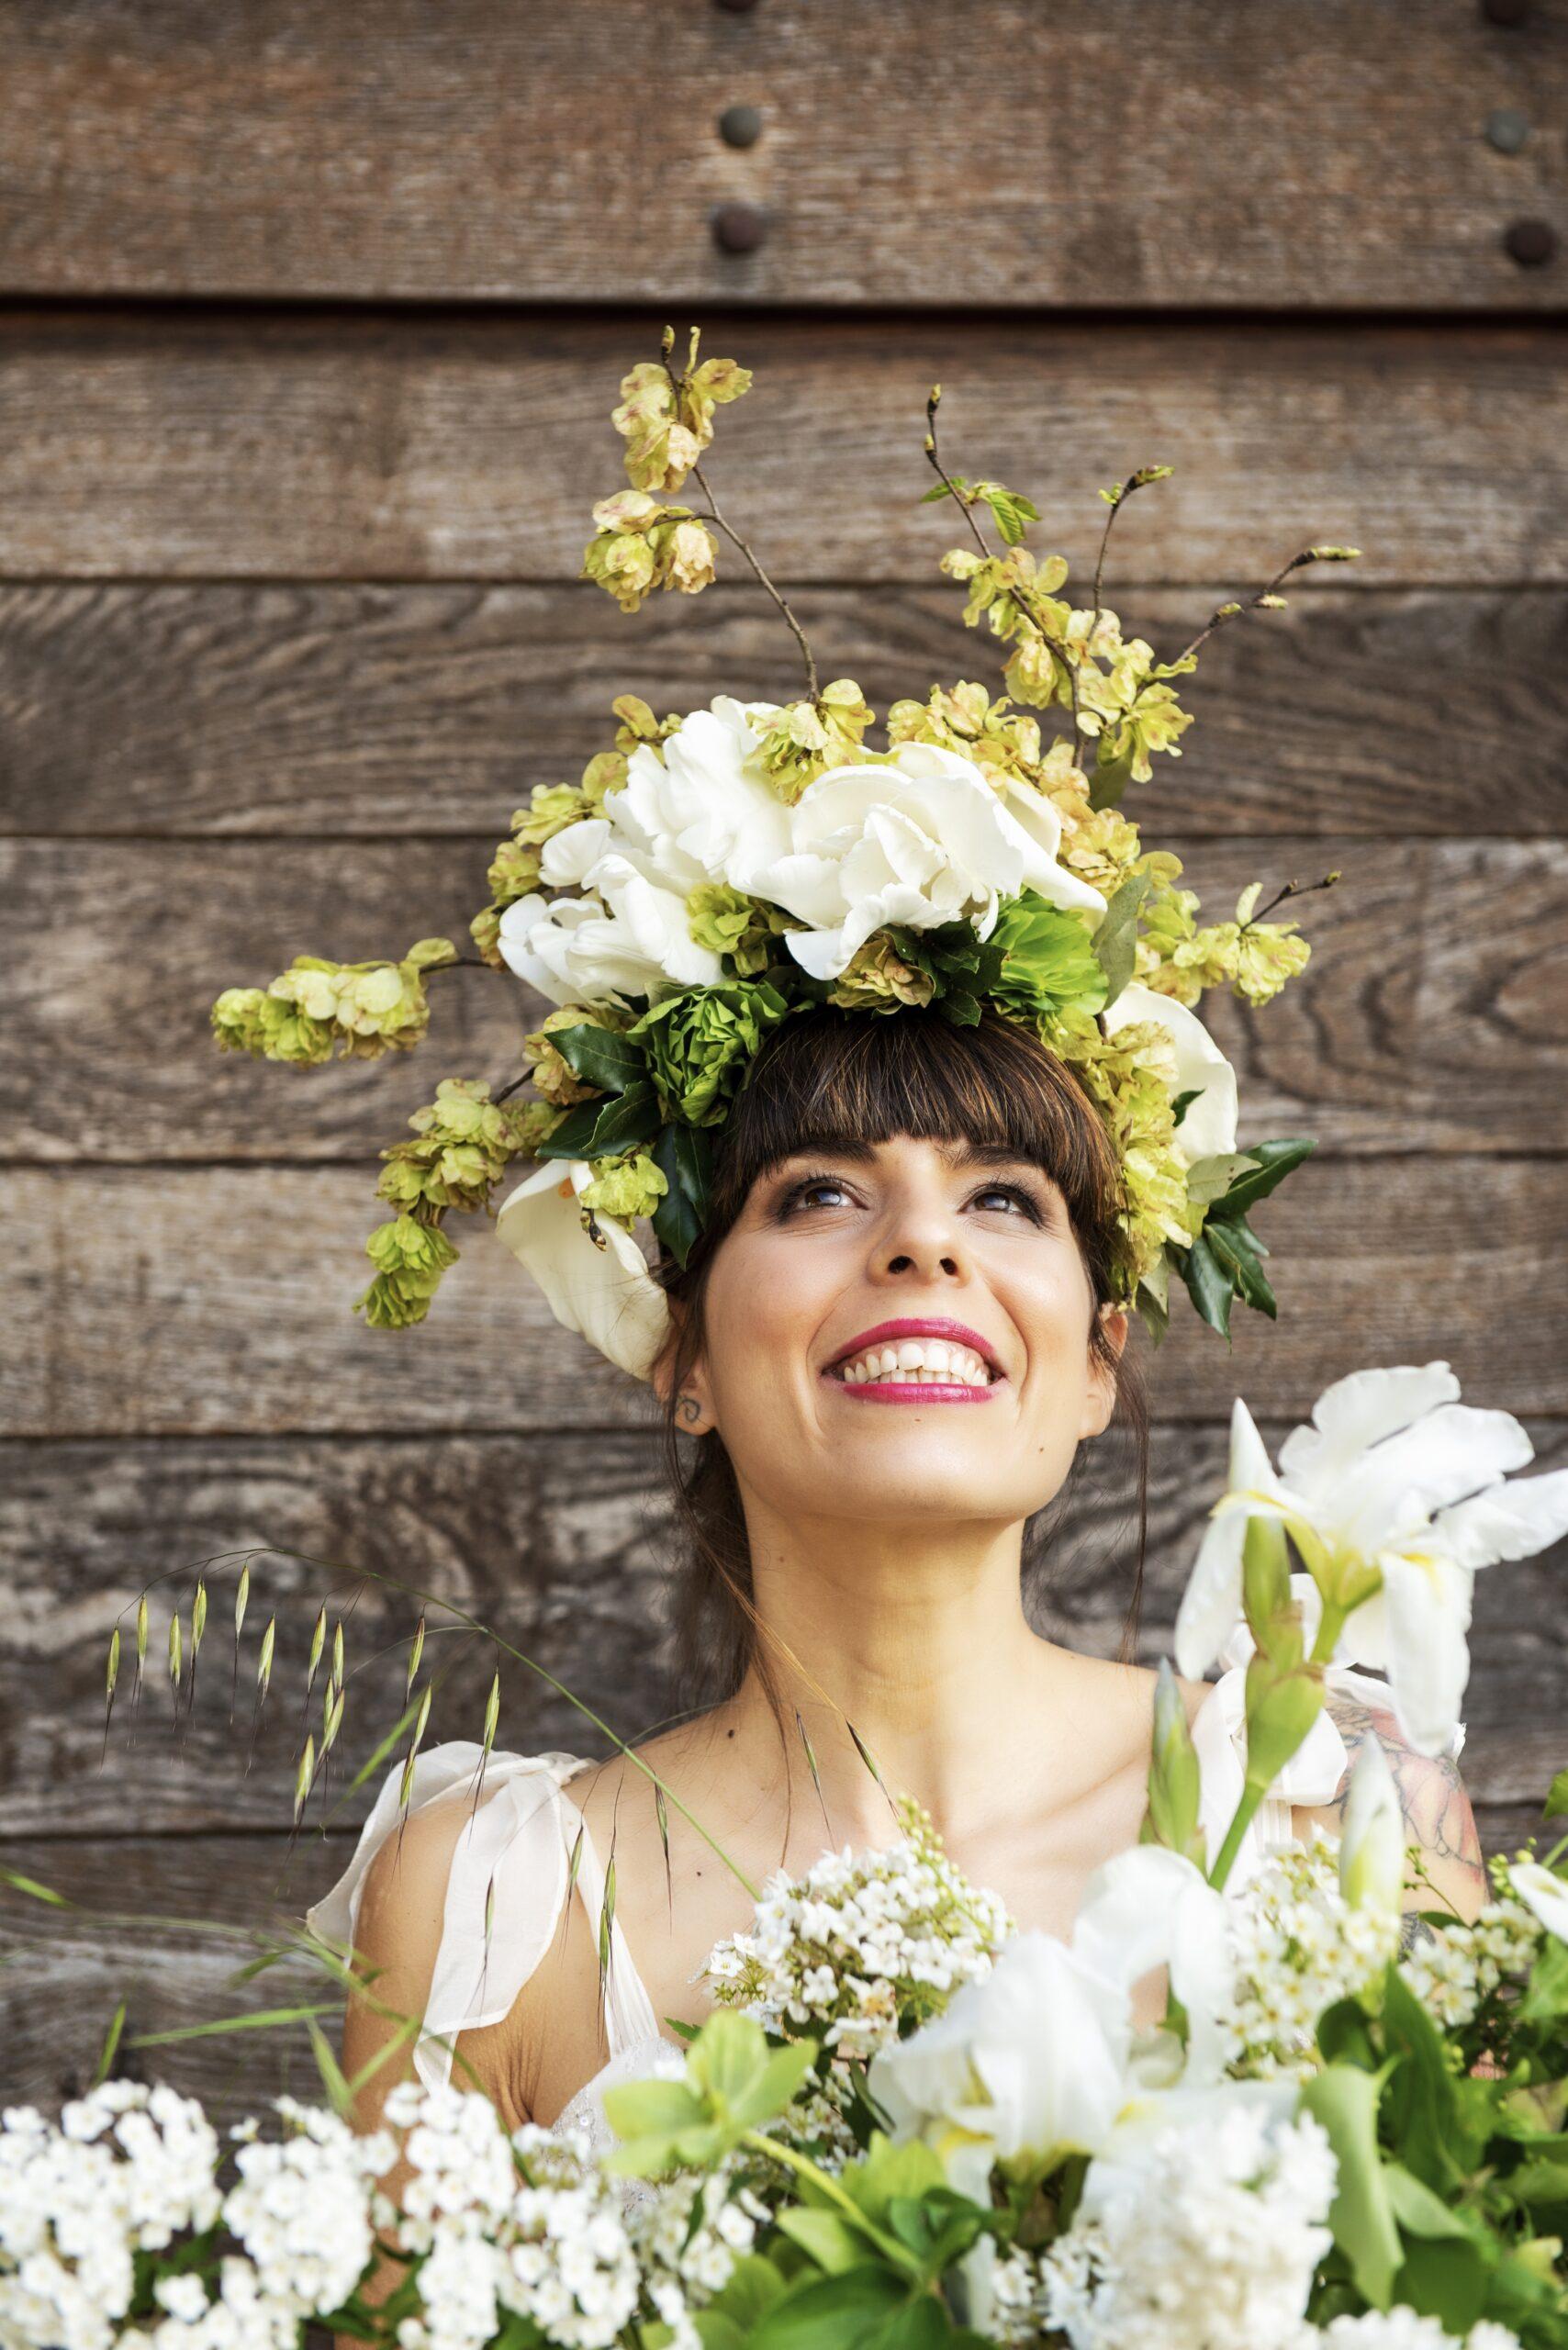 https://www.nanaweddingevents.com/wp-content/uploads/2021/07/Langhe_Wedding_Italy061-scaled.jpg